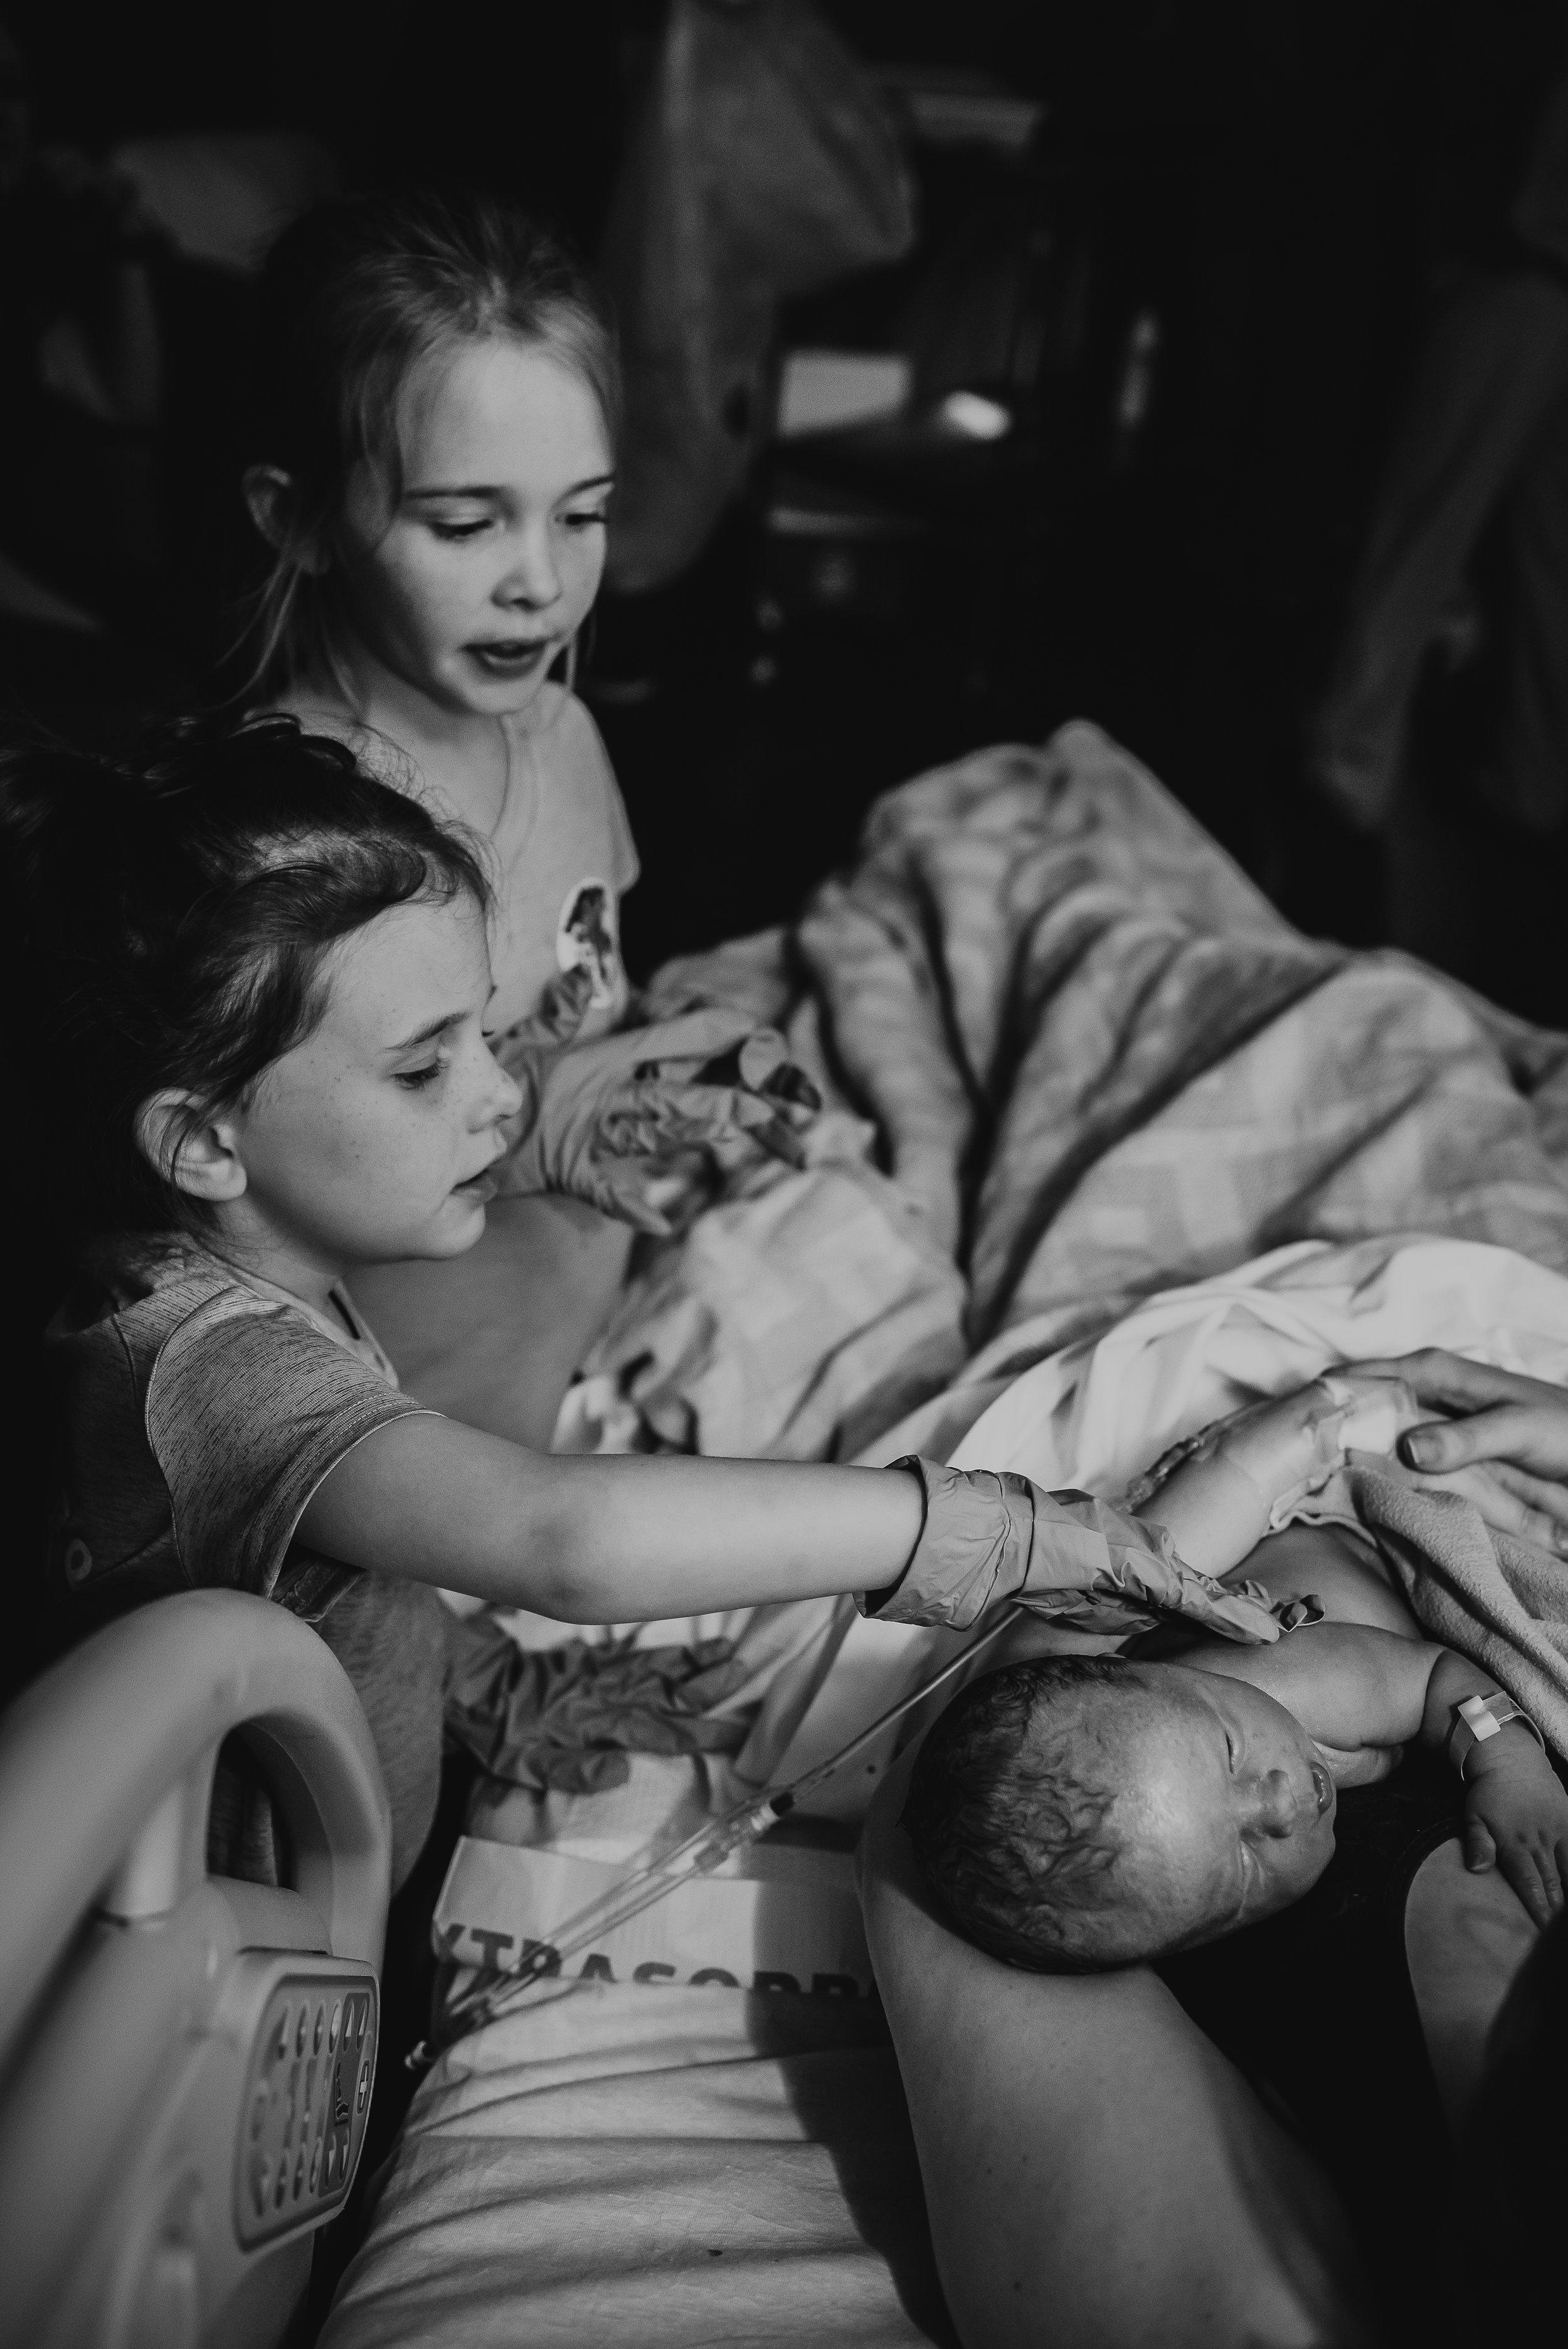 birth photography new orleans birth photographer covington la mandeville la Norhthore nola baton rouge stph lakeview louisiana birth with ICP cholestasis in pregnancy 36 weeks